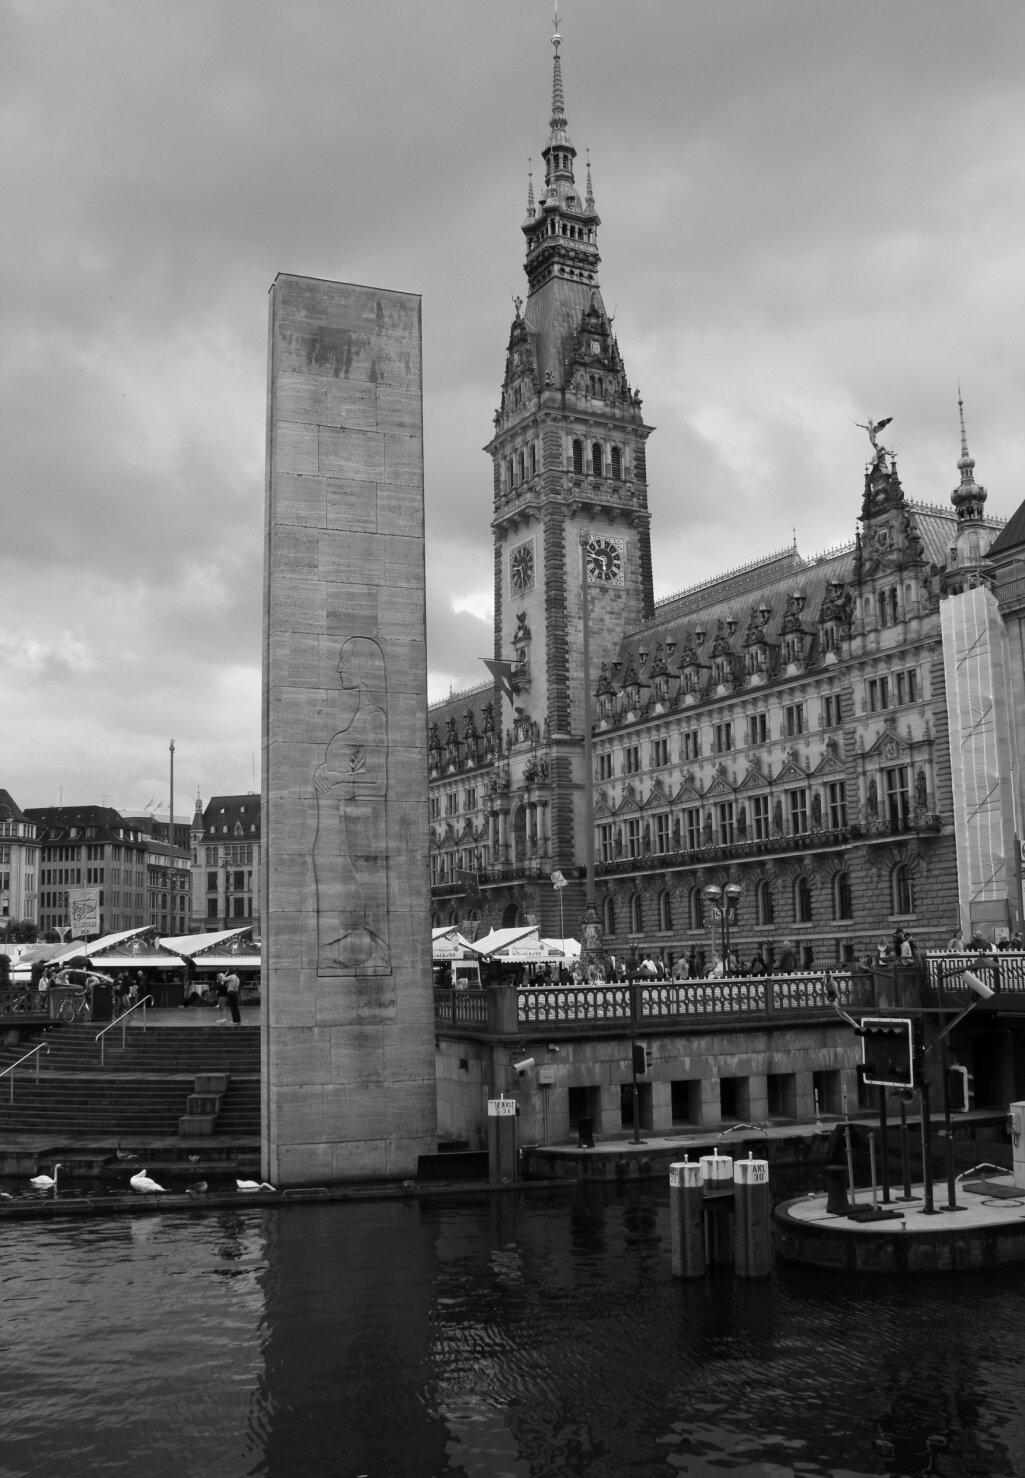 Ernst Barlach's memorial, Hamburg, photo by T. Ferenc.